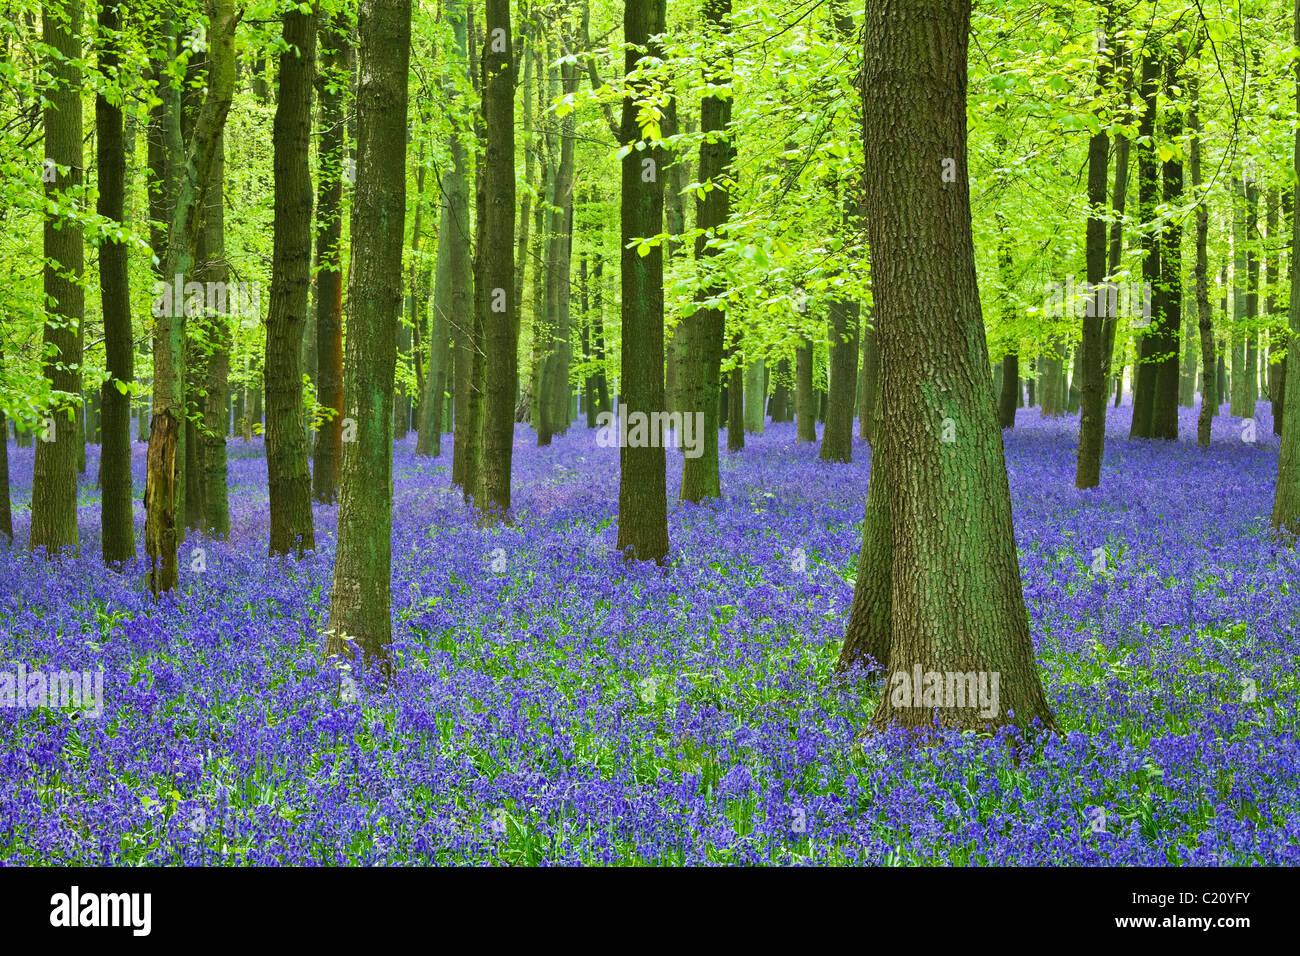 Bluebells(Hyacinthoides non-script)  in beech tree (Fagus sylvatica) wood, Hertfordshire, England, UK Stock Photo